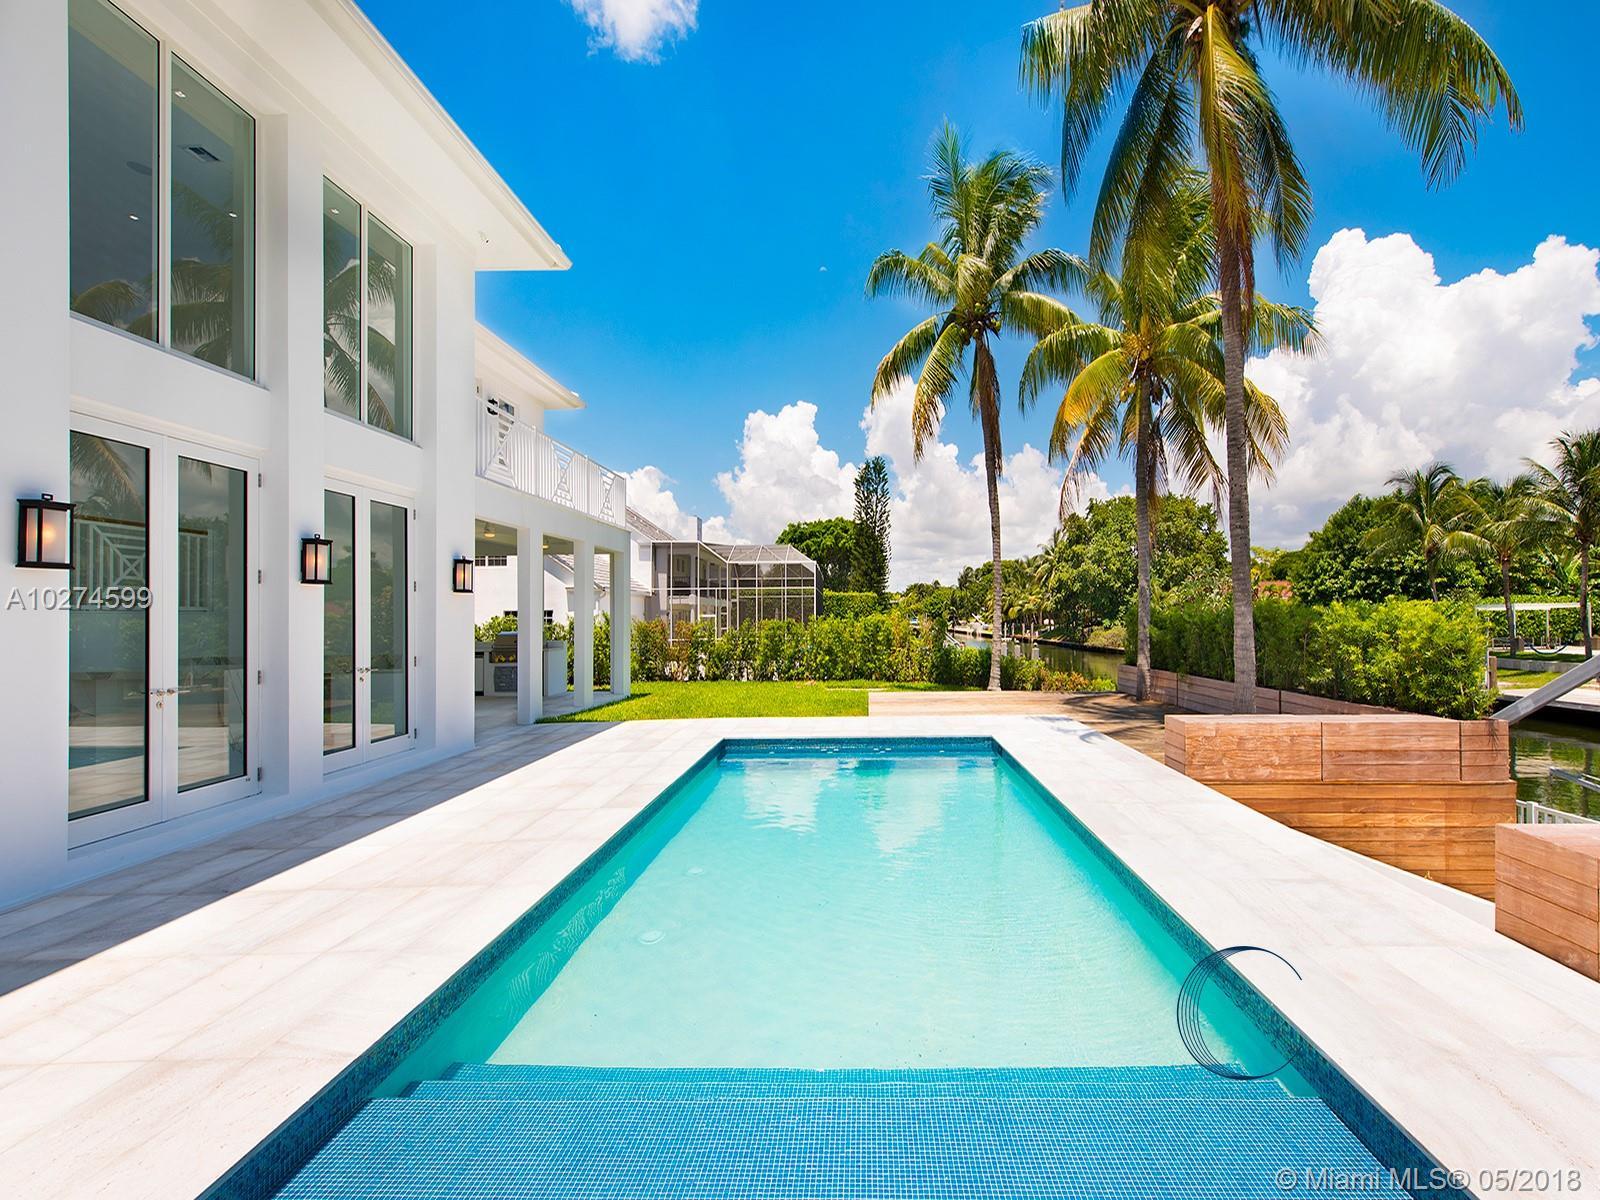 741 Buttonwood Ln, Miami , FL 33137